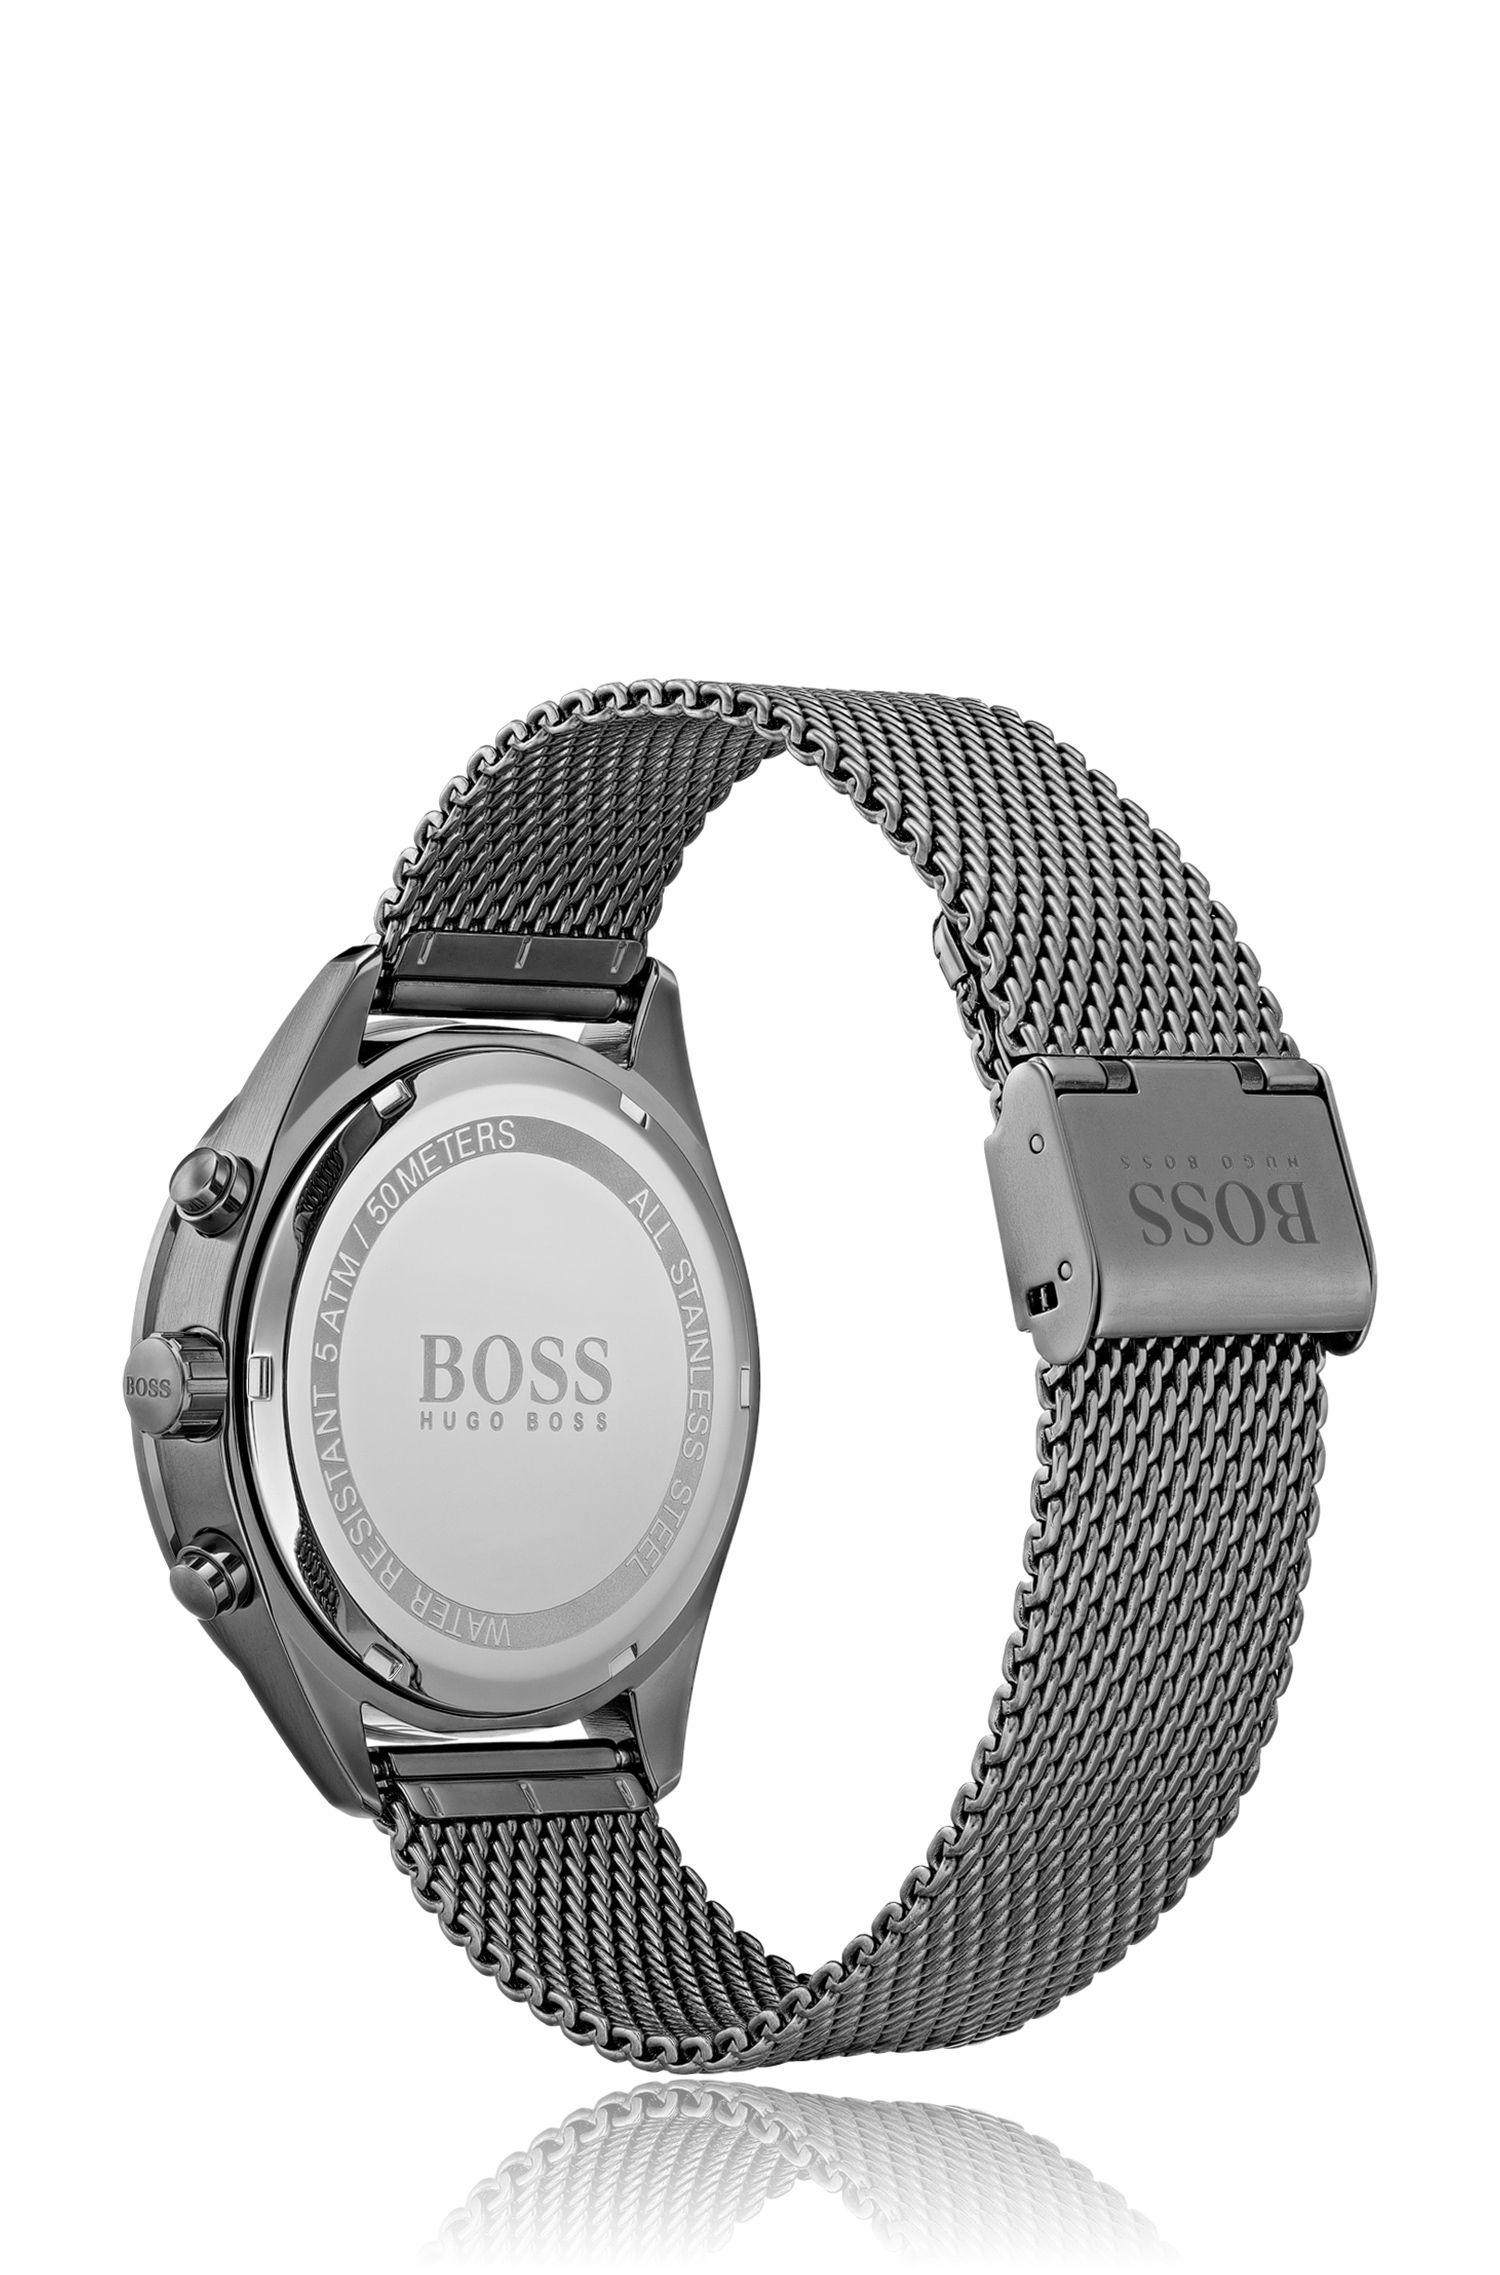 Grau beschichteter Chronograph mit Mesh-Armband, Silber